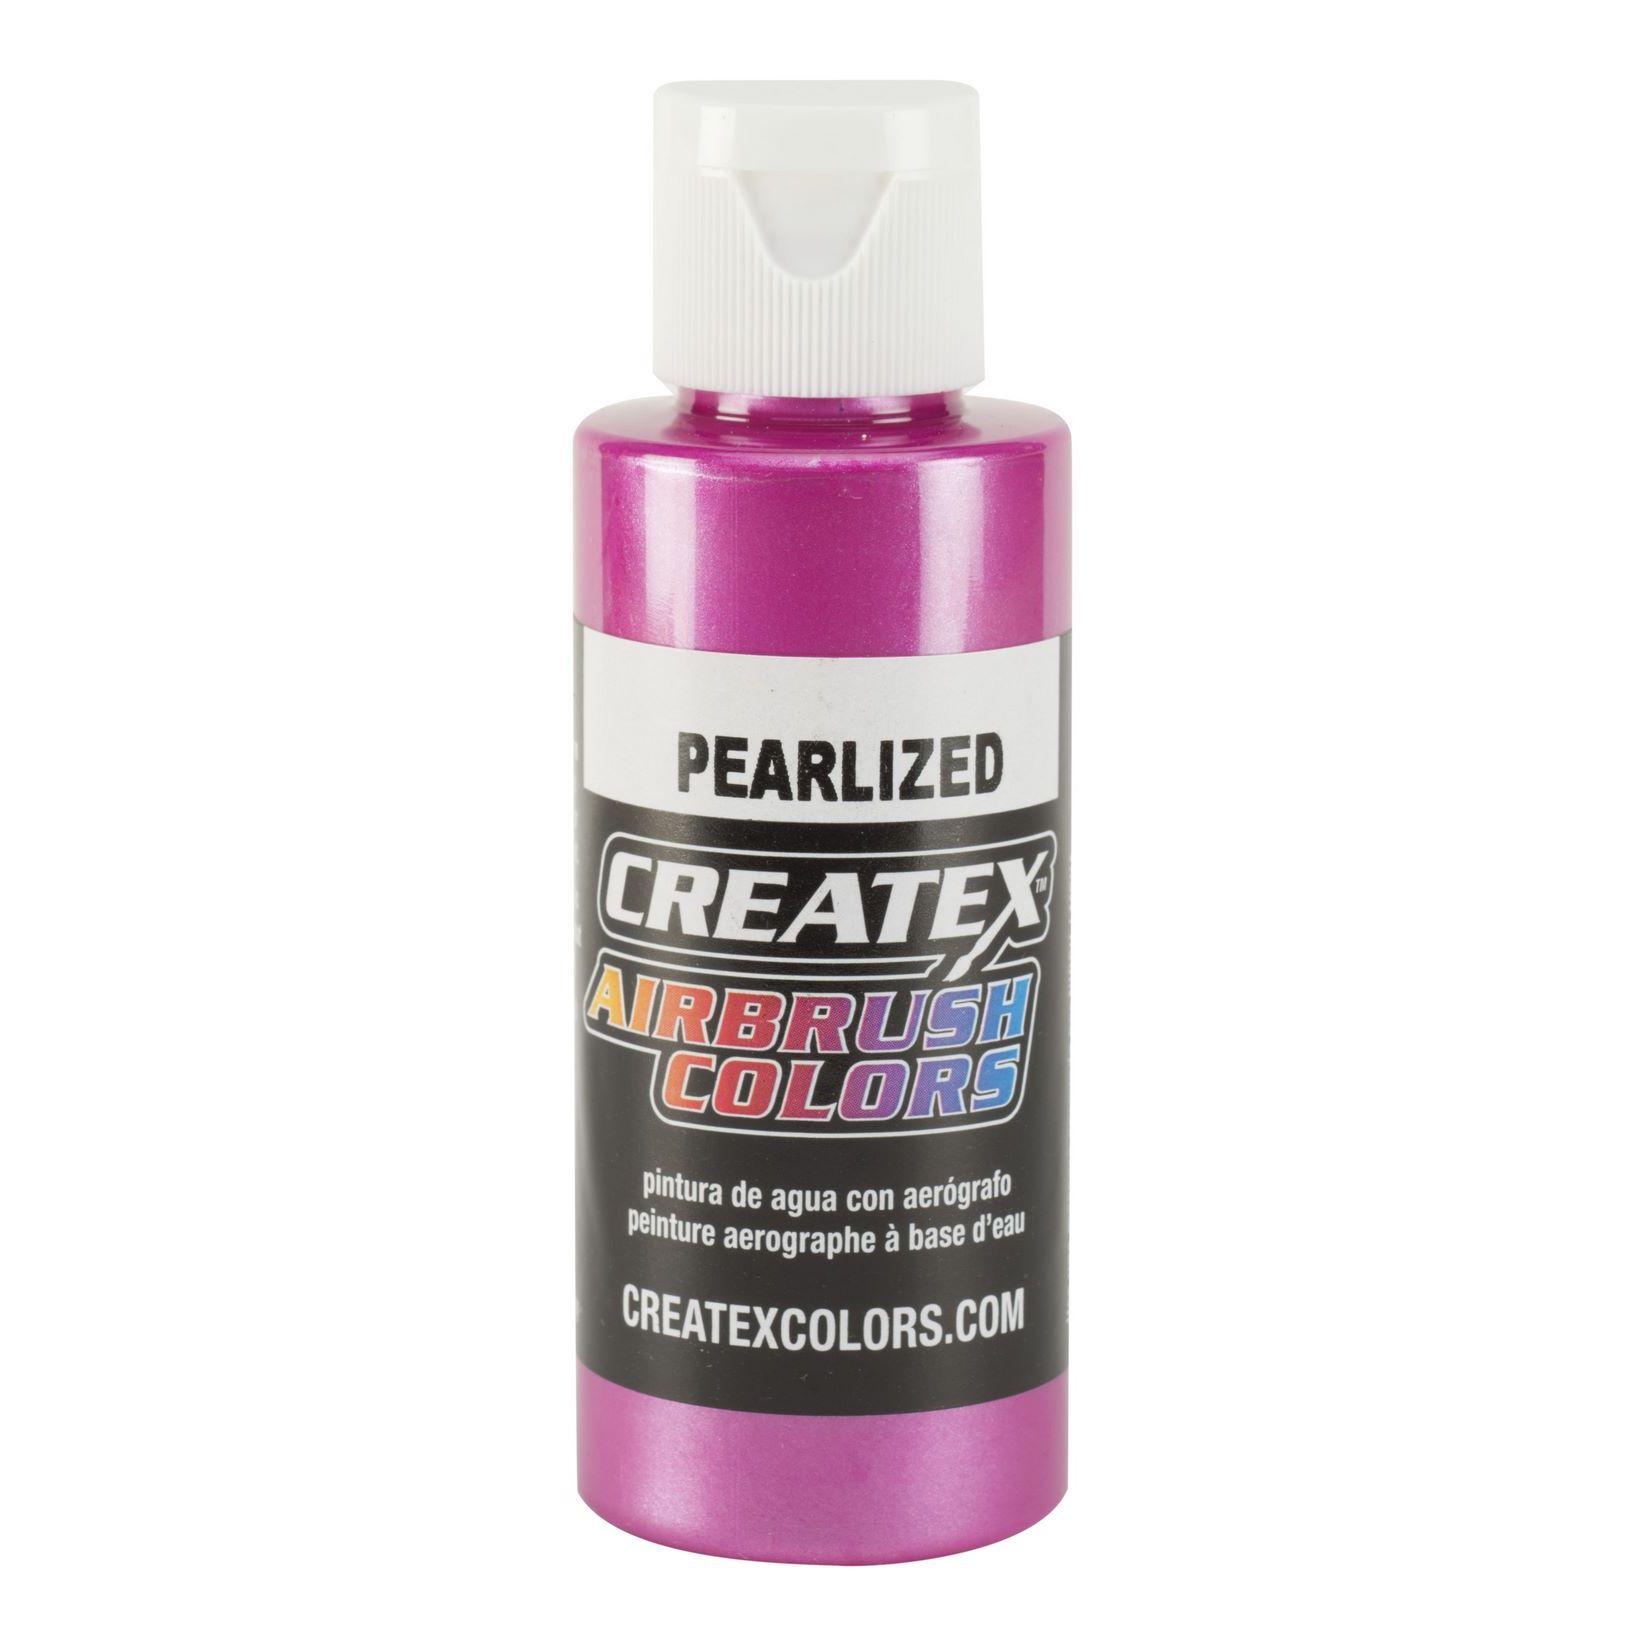 pearl magenta Createx Airbrush Colors Farbe 60ml 11 5302 Createx